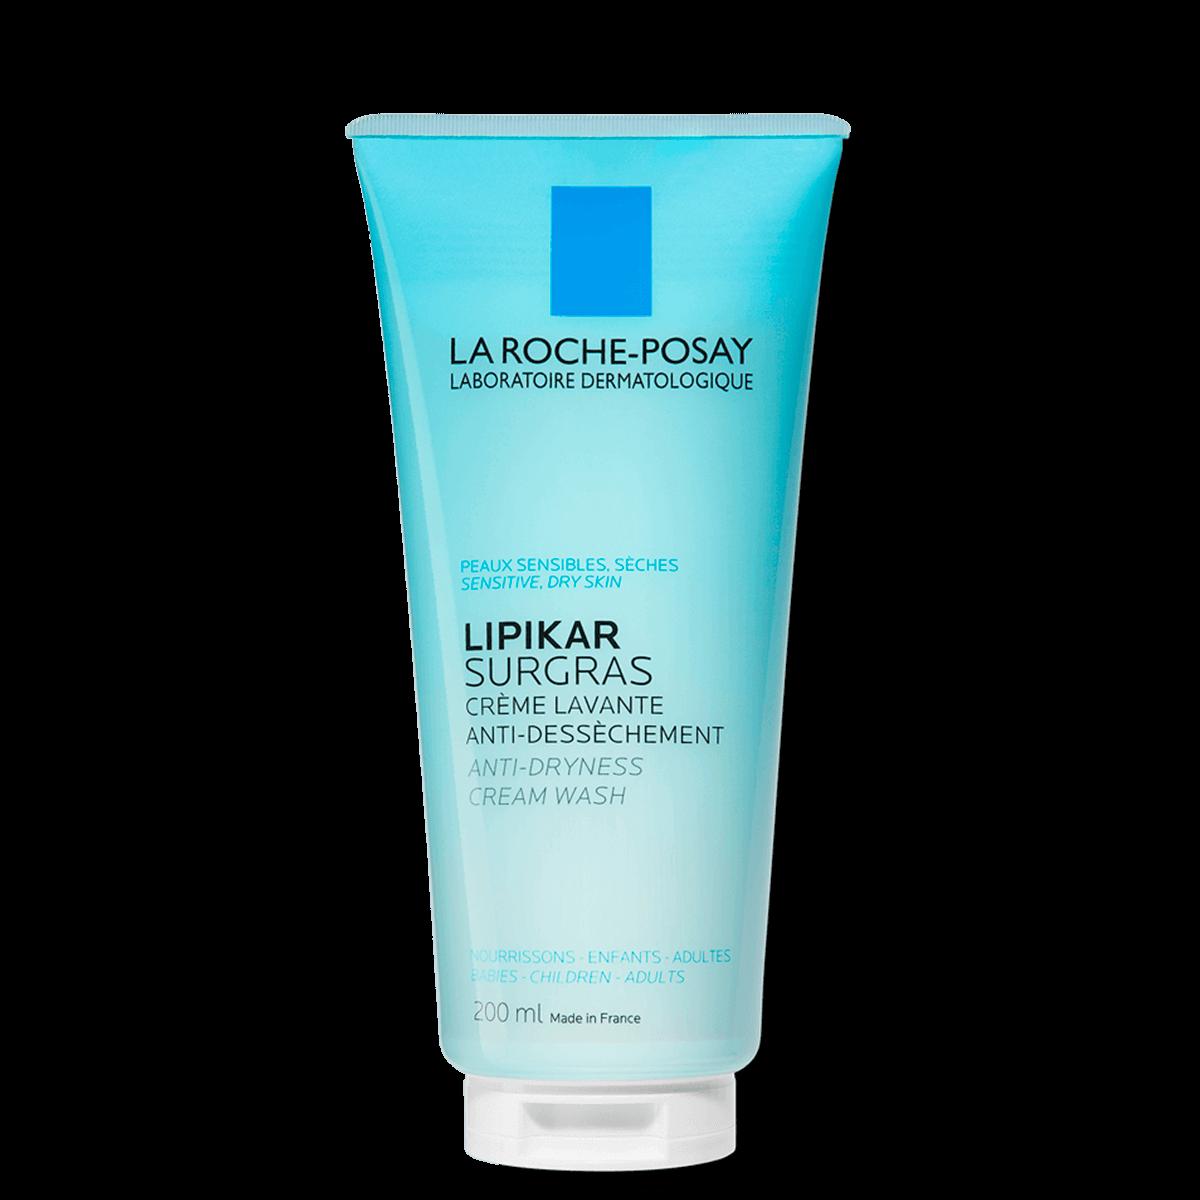 La Roche Posay ProductPage Eczema Lipikar Surgras 200ml 3433422408593